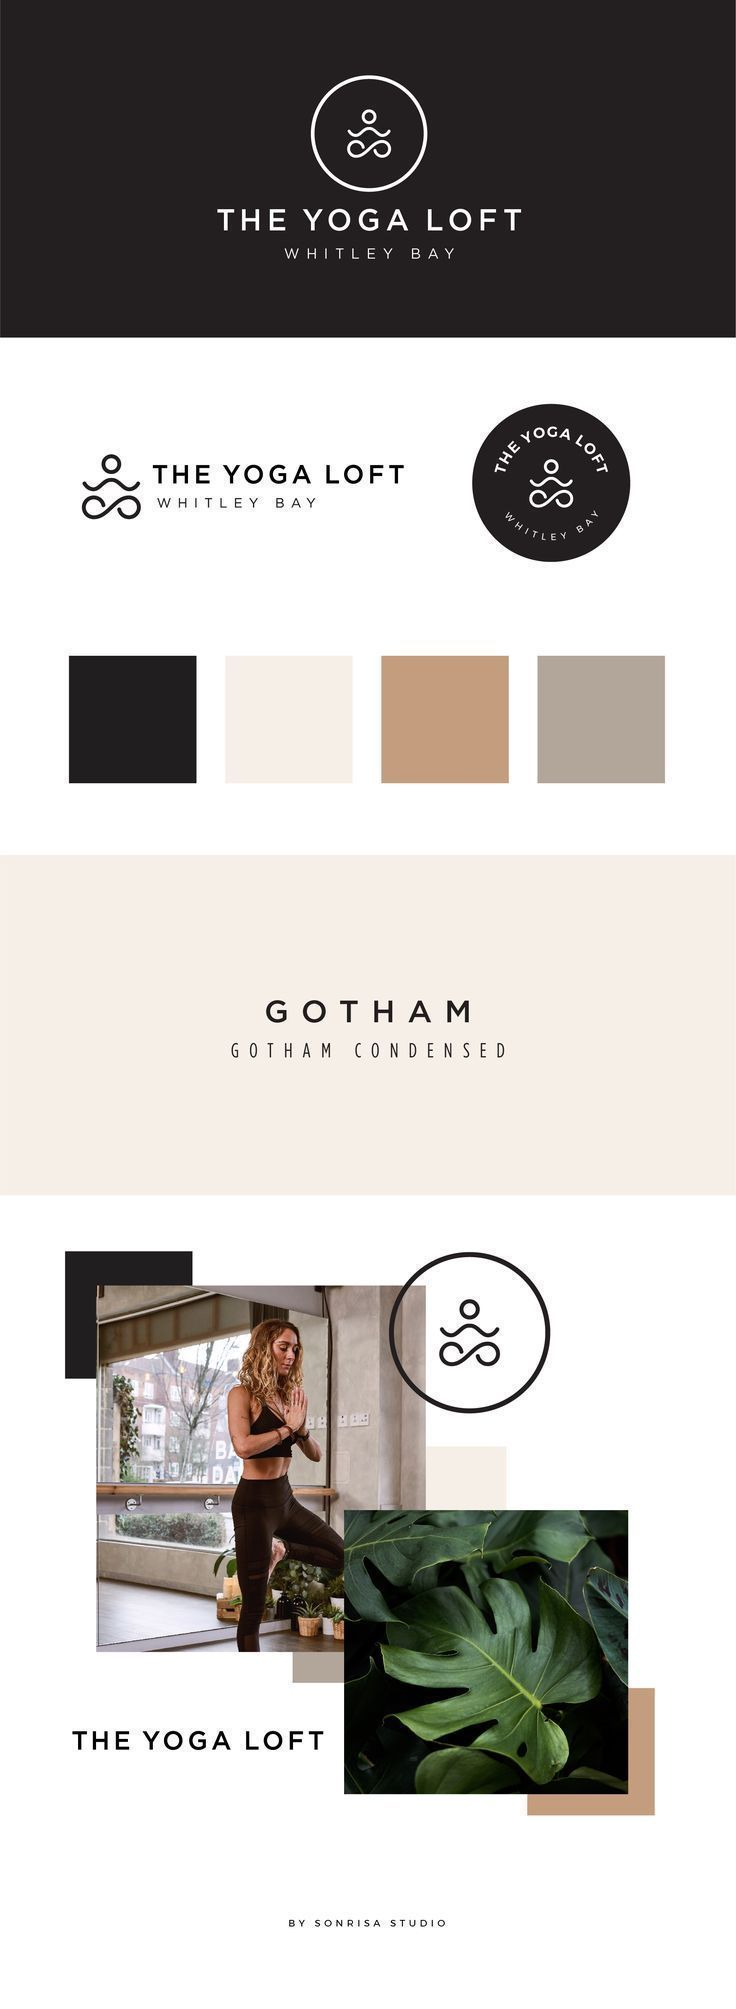 Yoga And Wellness Brand Design And Mood Board In 2020 Identity Design Logo Brand Identity Design Logo Inspiration Logo Design Inspiration Branding